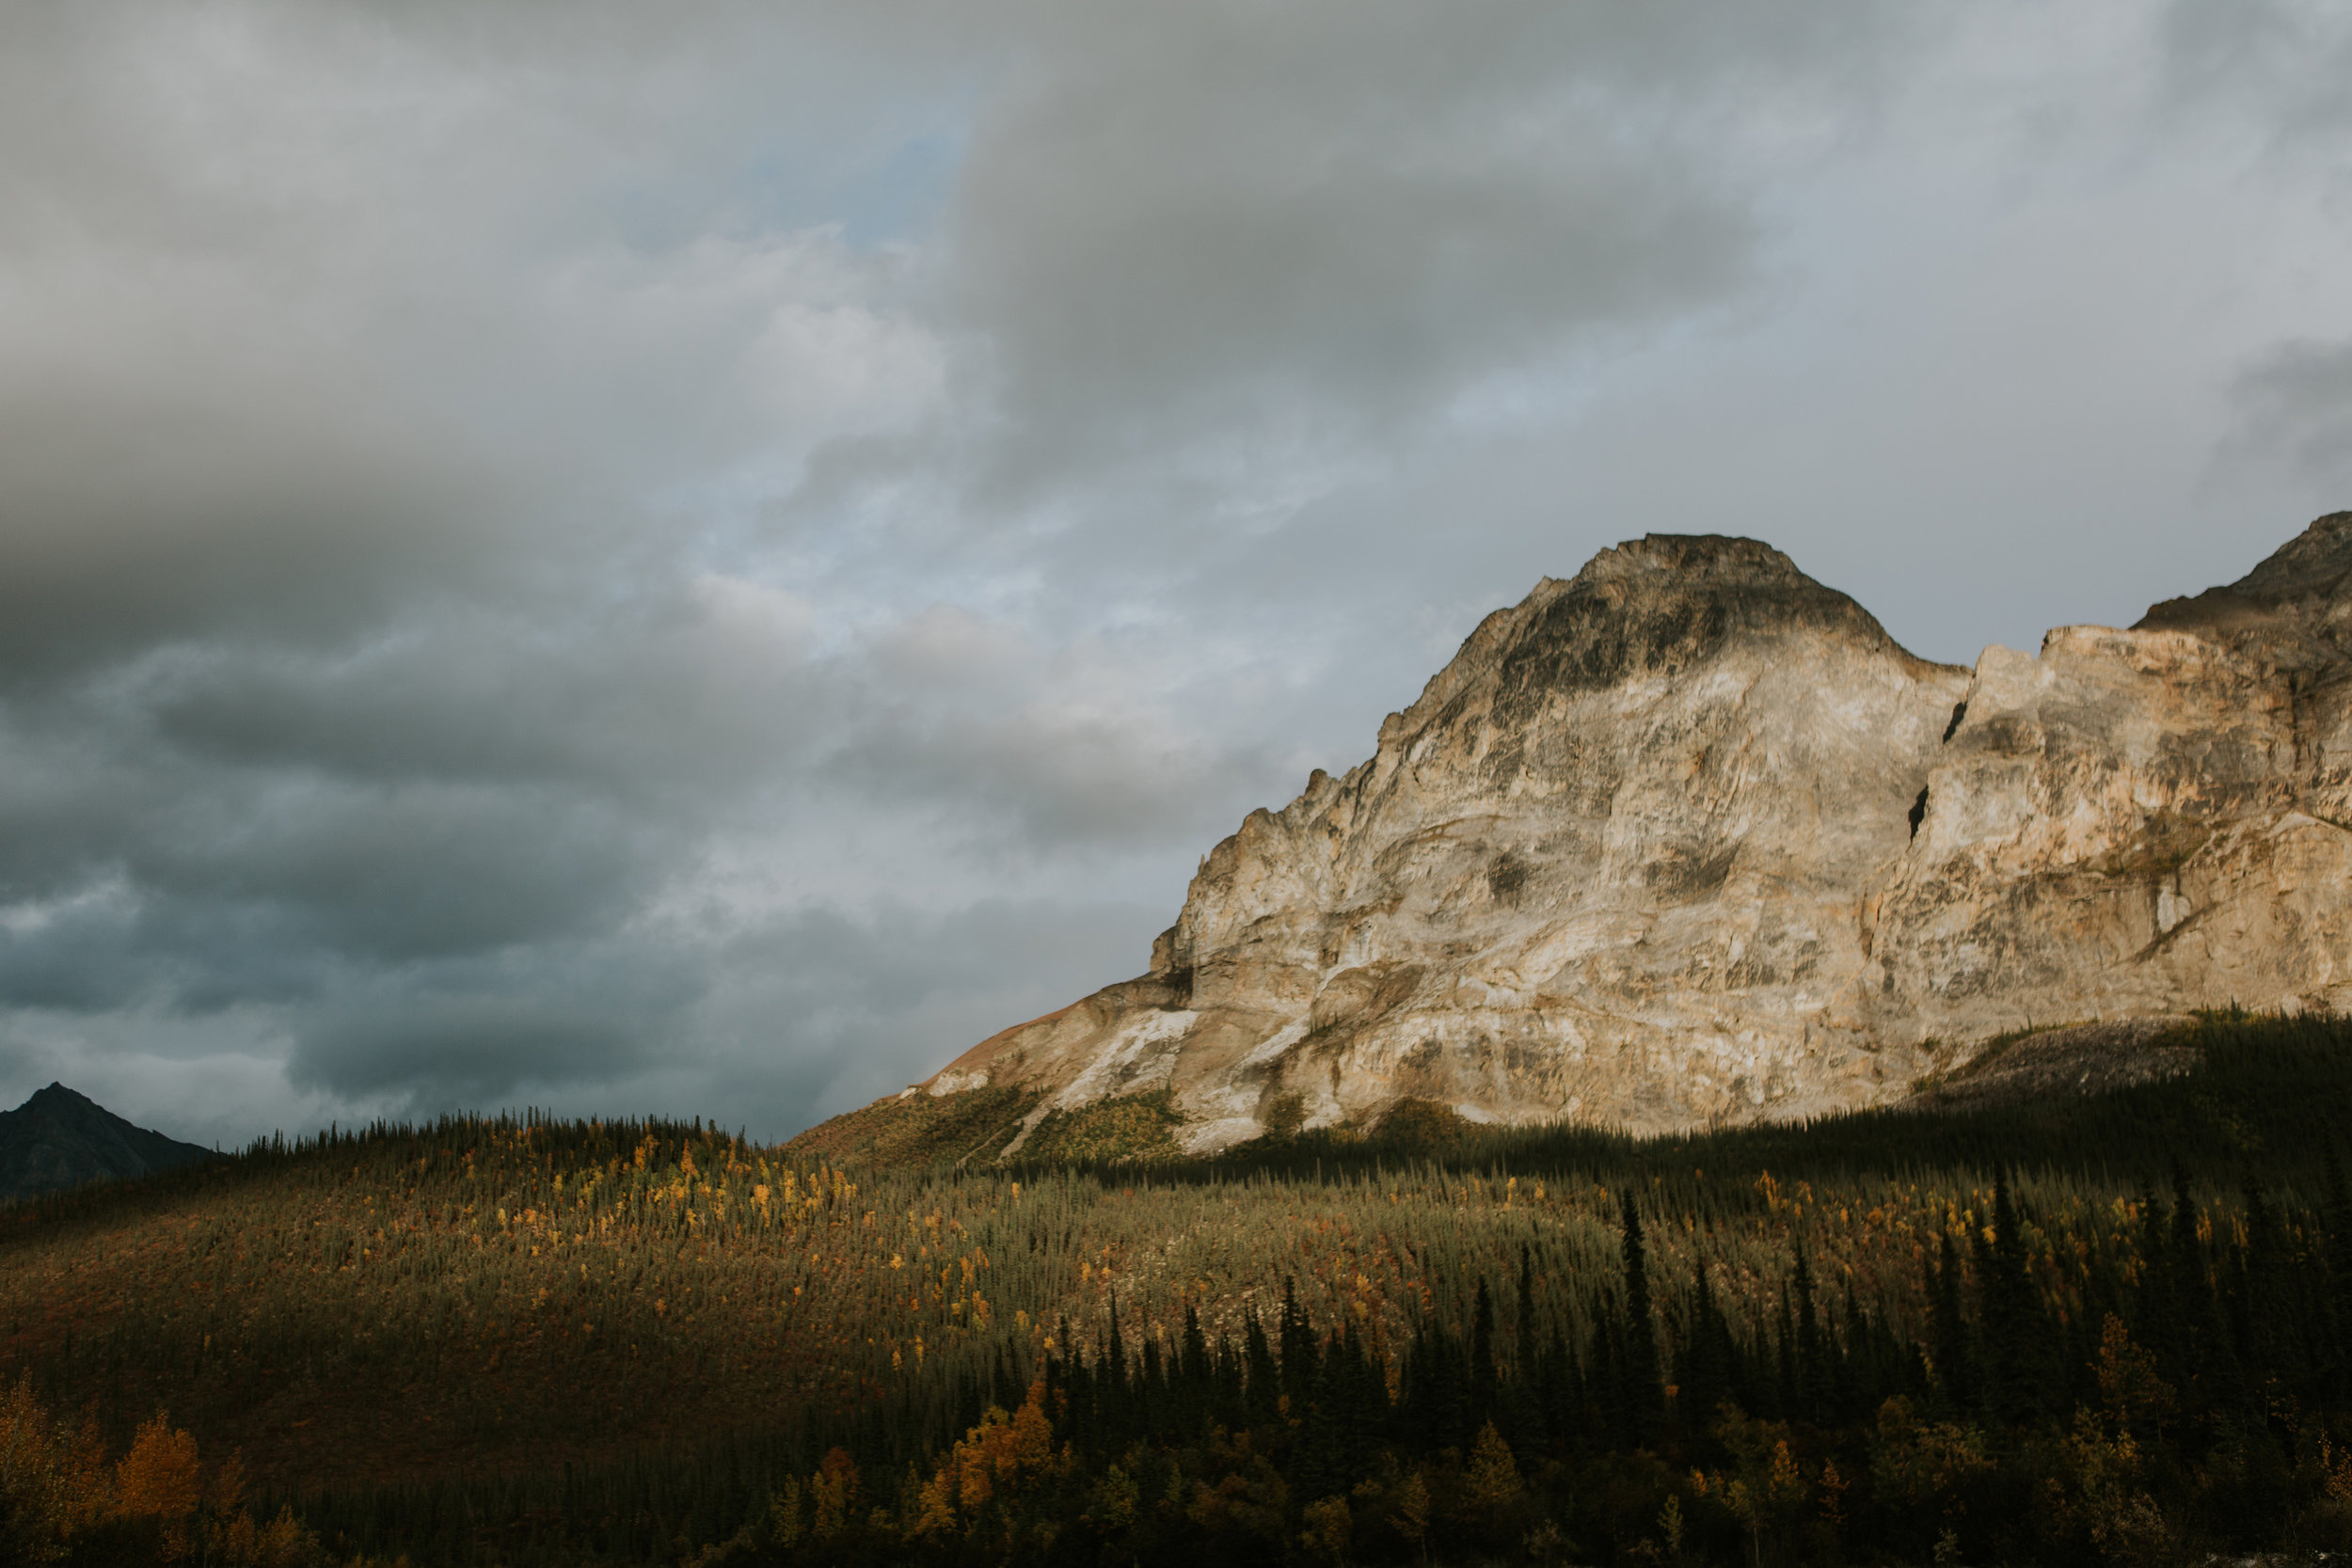 CindyGiovagnoli_Alaska_KoyukukRiver_SukakpakMountain_JimRiver_ArcticCircle_fly_fishing_September-022.jpg